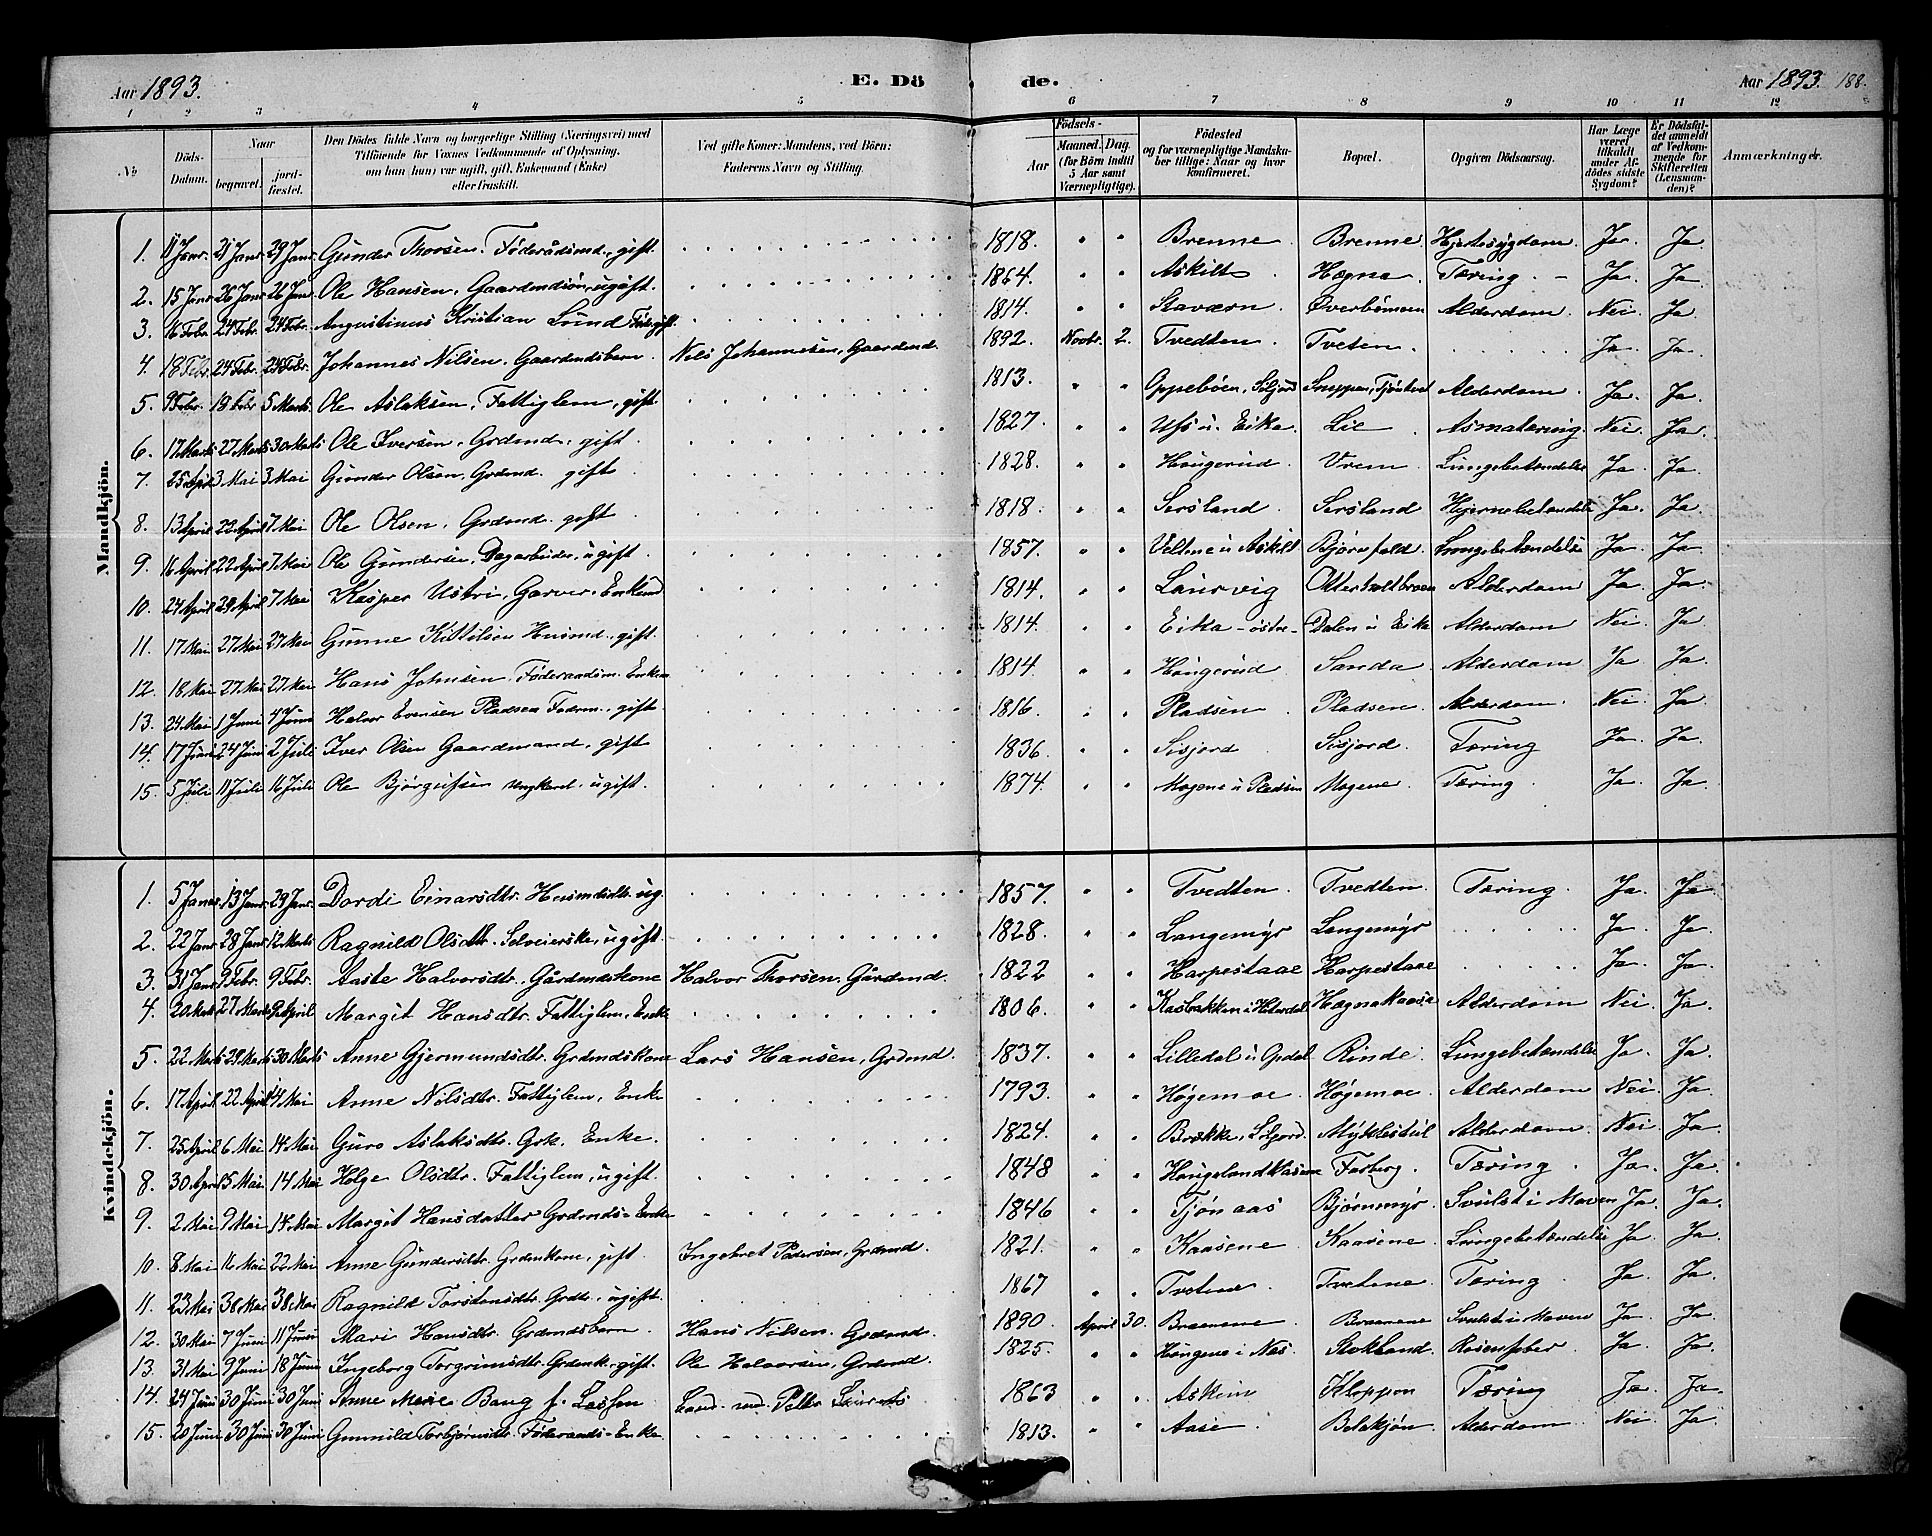 SAKO, Bø kirkebøker, G/Ga/L0005: Klokkerbok nr. 5, 1883-1897, s. 188